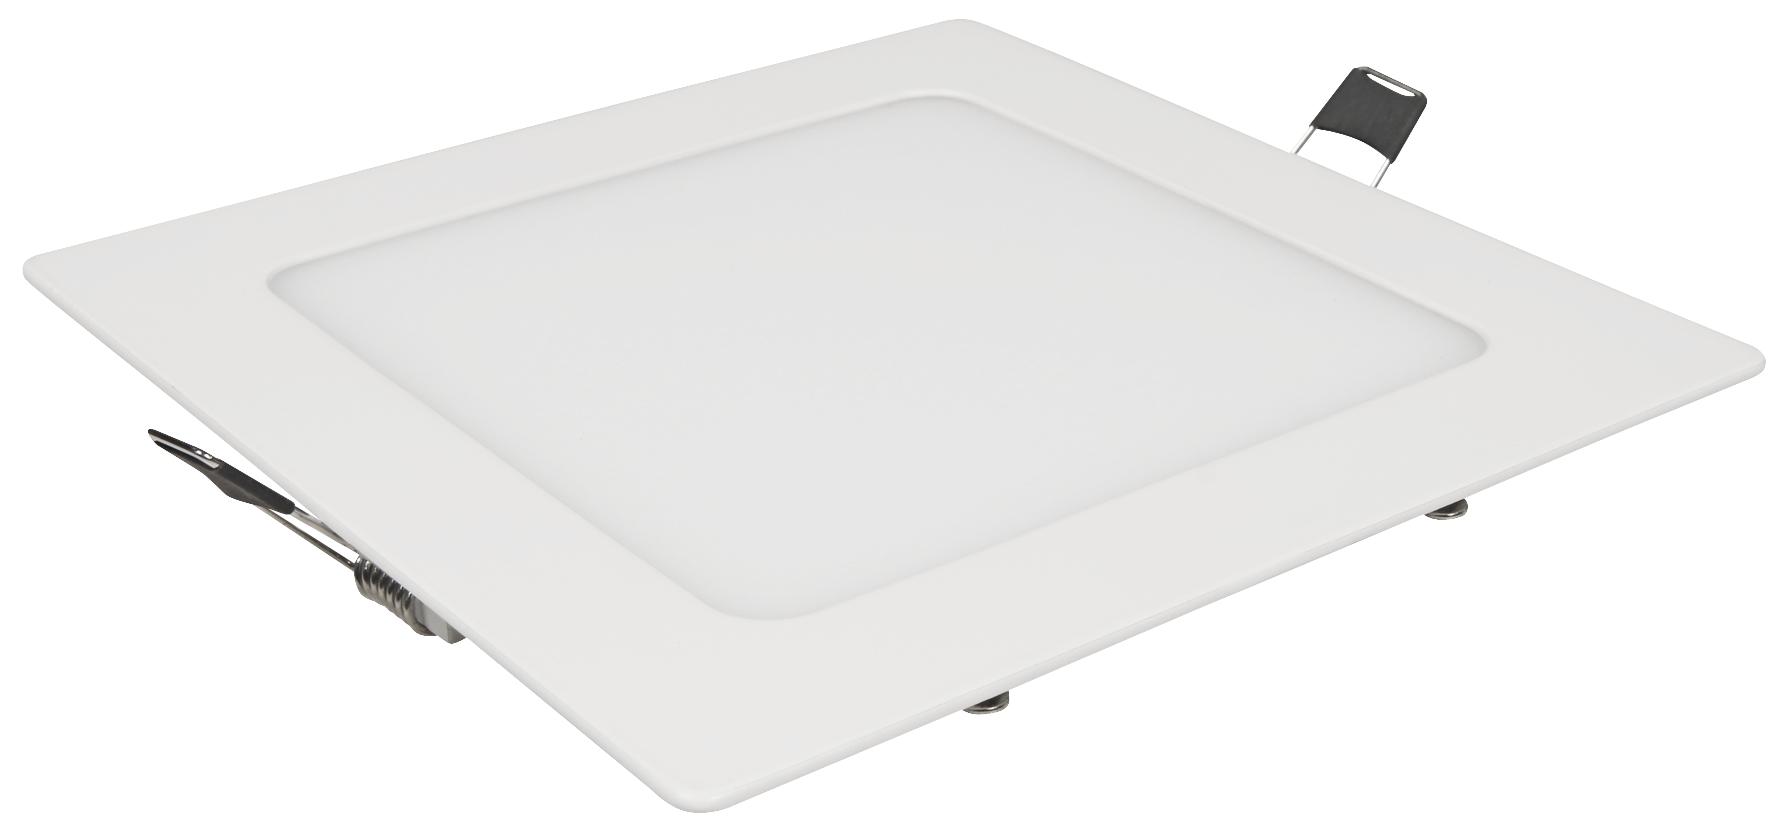 LED-Panel McShine ''LP-1217SW'', 12W, 170x170mm, 780 lm, 3000K, warmweiß